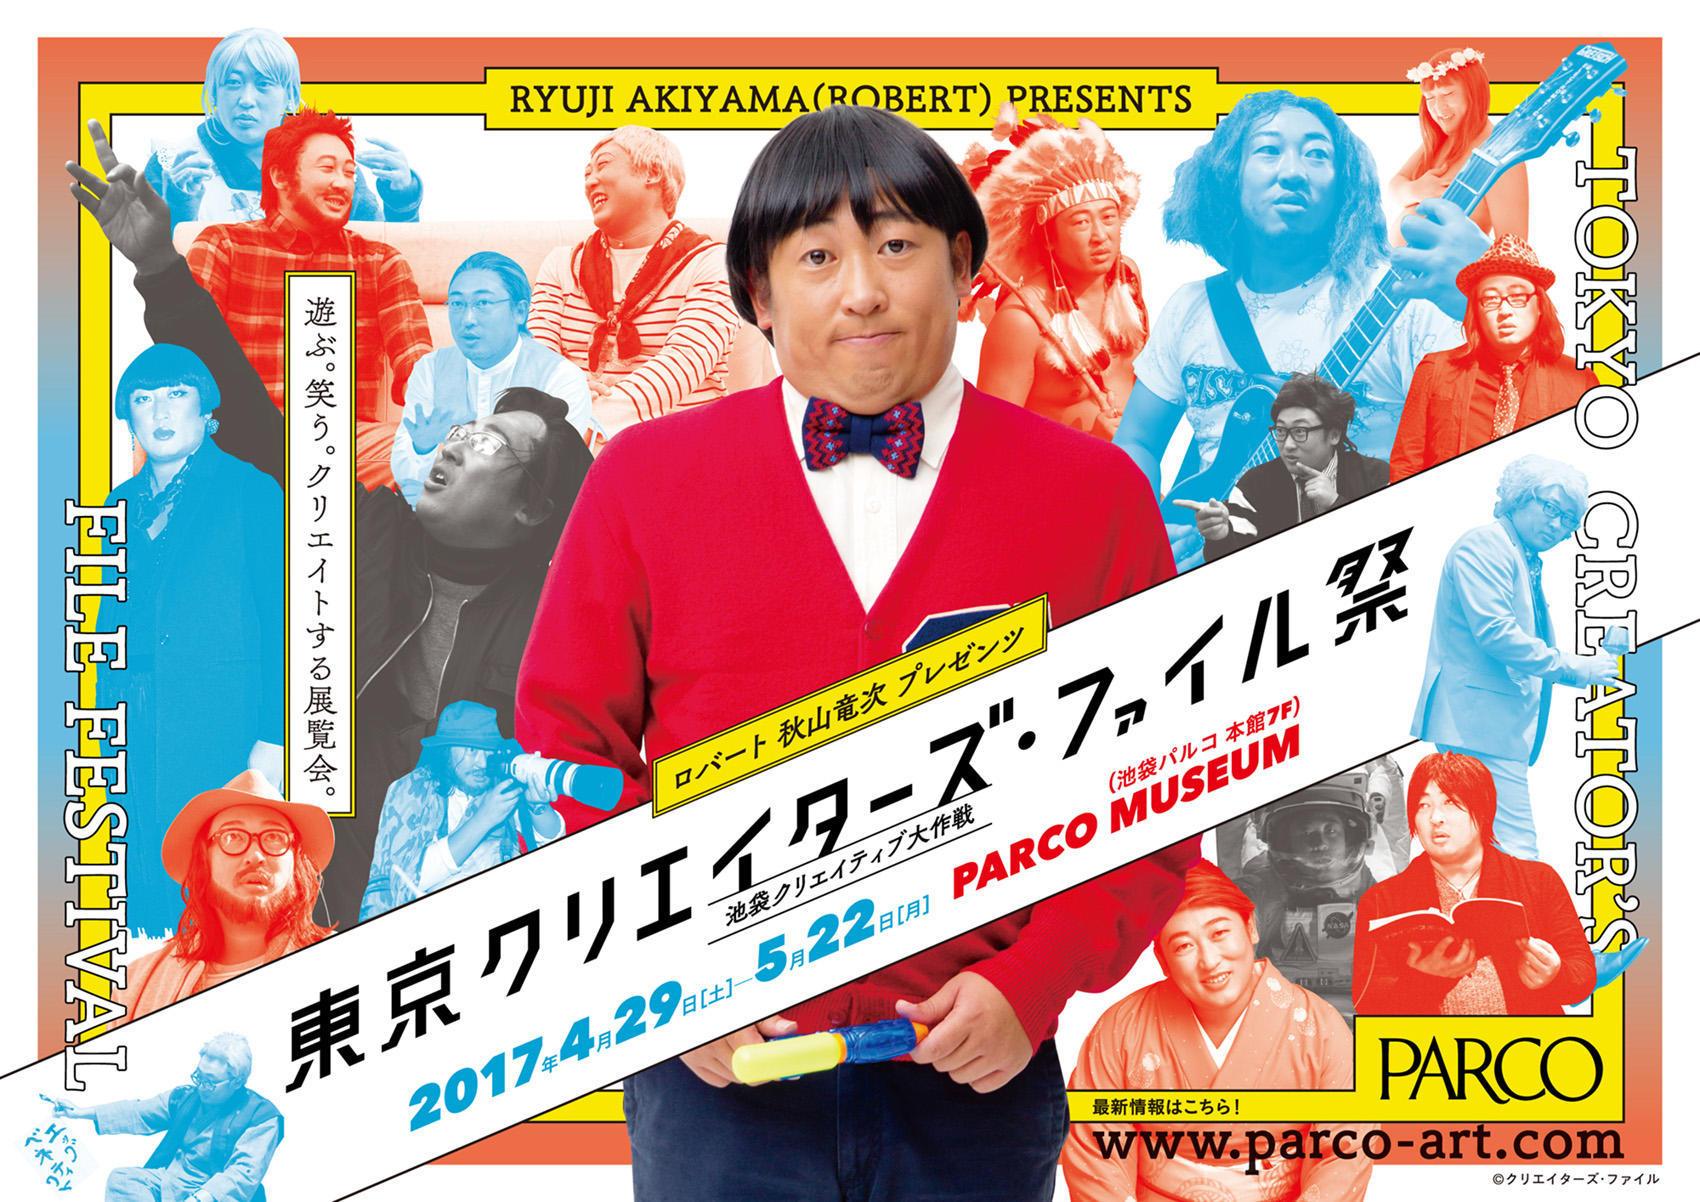 http://news.yoshimoto.co.jp/20170429002951-749e2d4ea0884a856fb4738e44cfd438426f6004.jpg